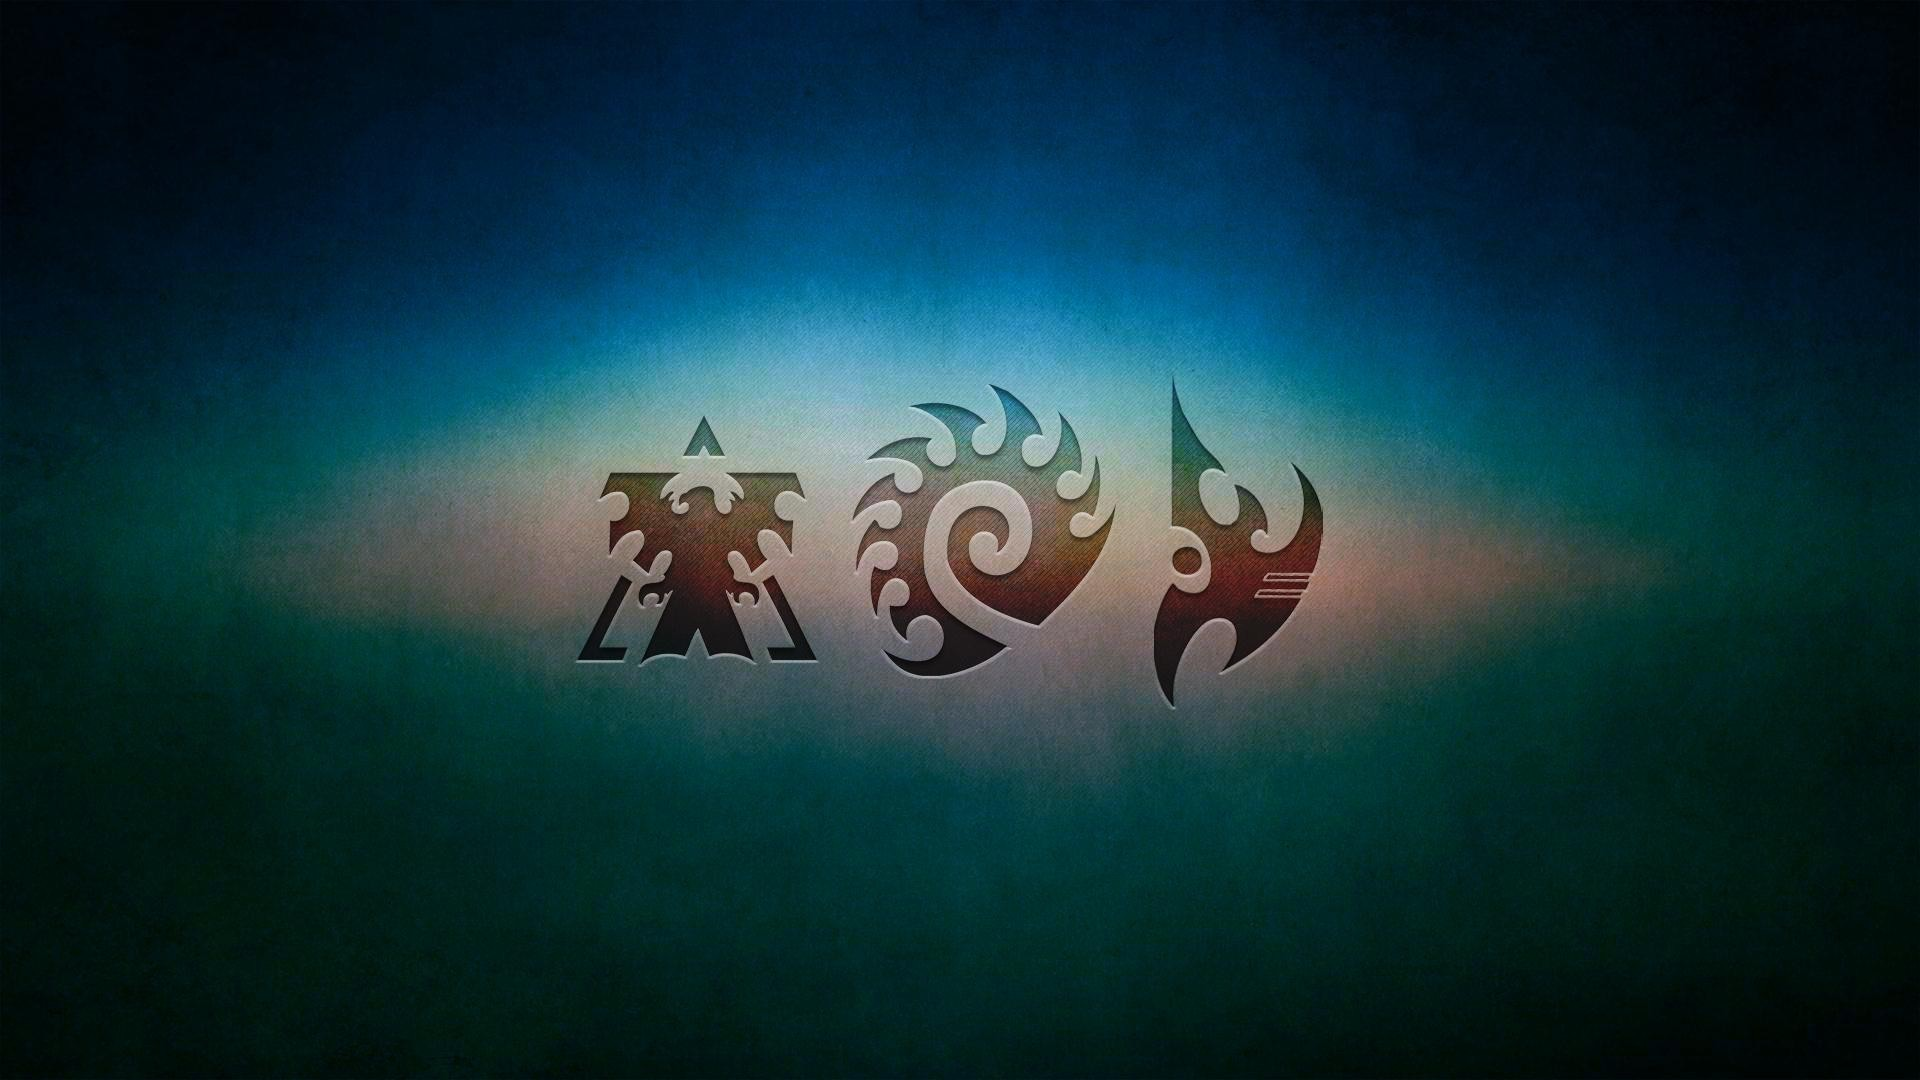 Protoss StarCraft II Terran Zerg